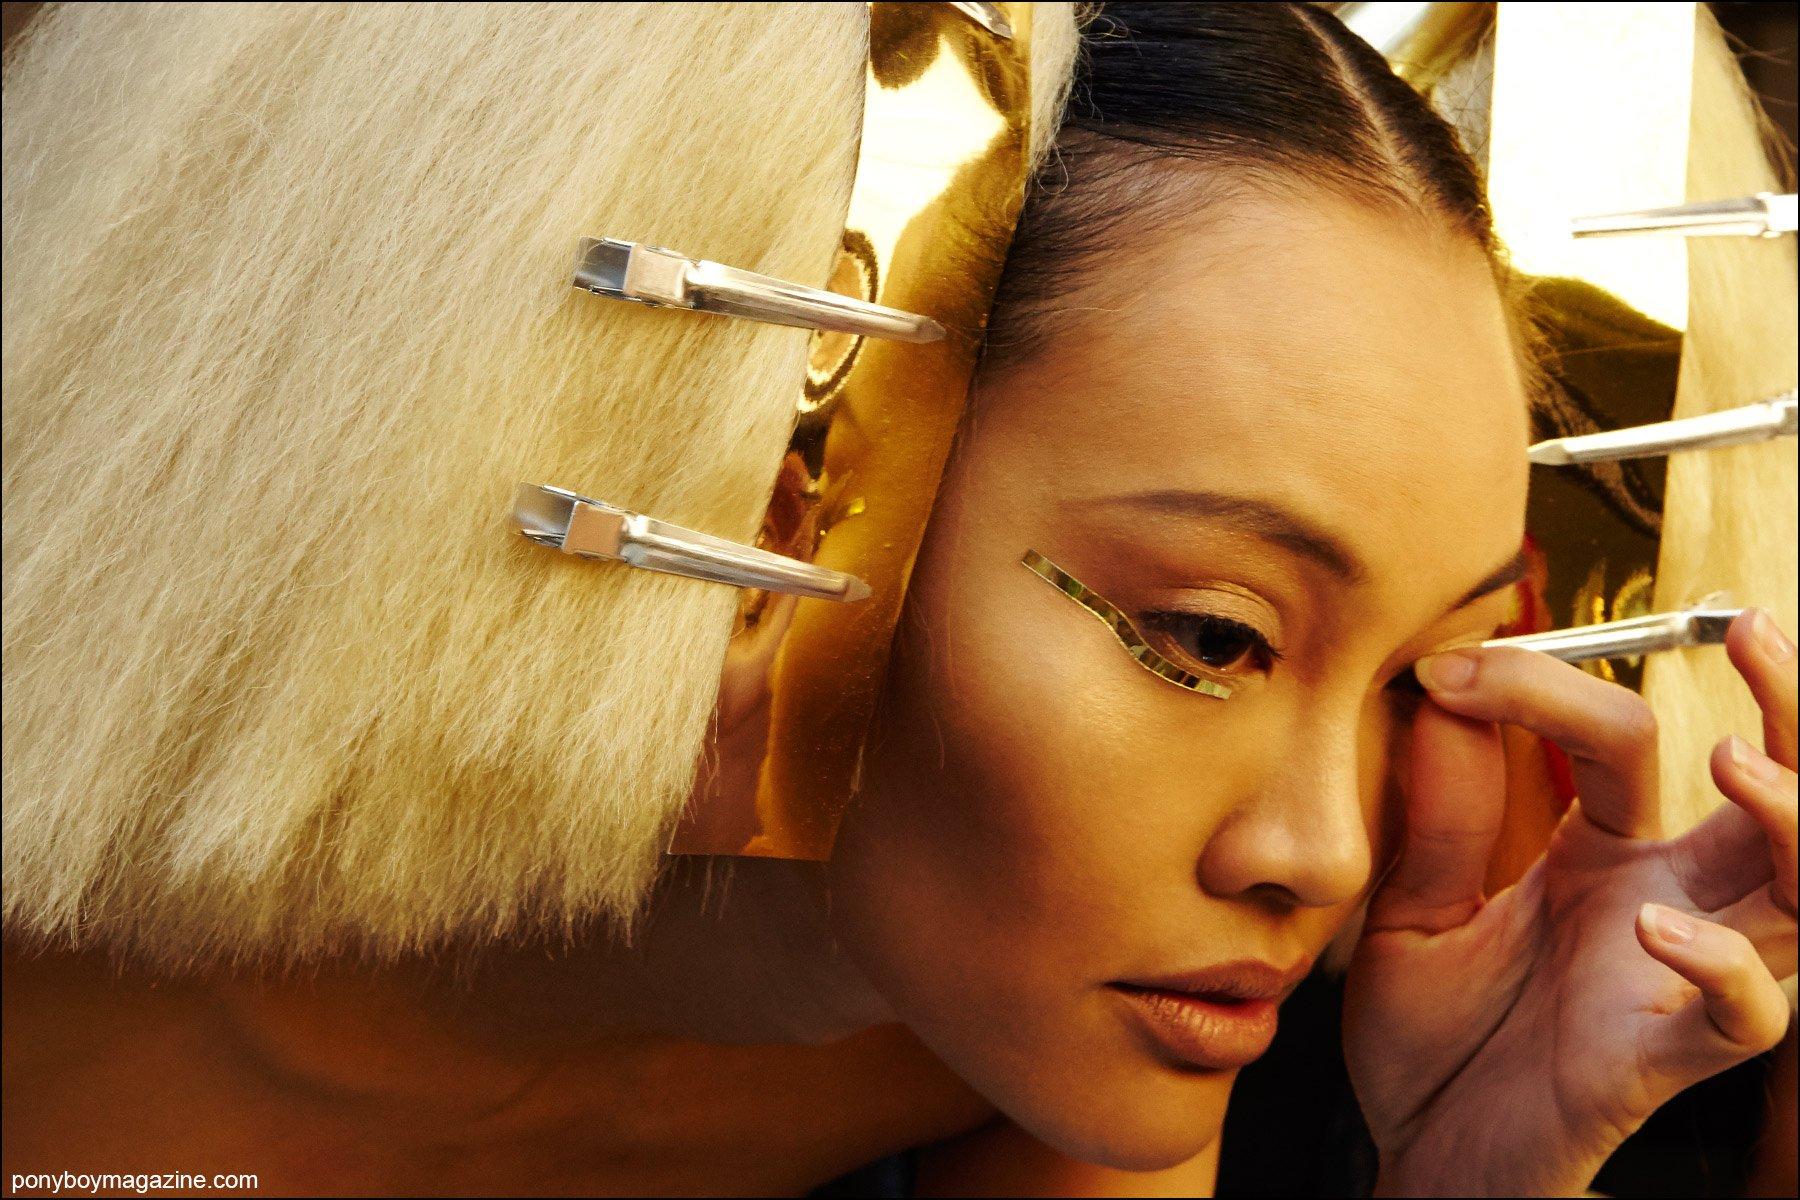 A model backstage adjusts her false eyelash, photographed at the Blonds S/S16 show by Alexander Thompson for Ponyboy magazine NY.